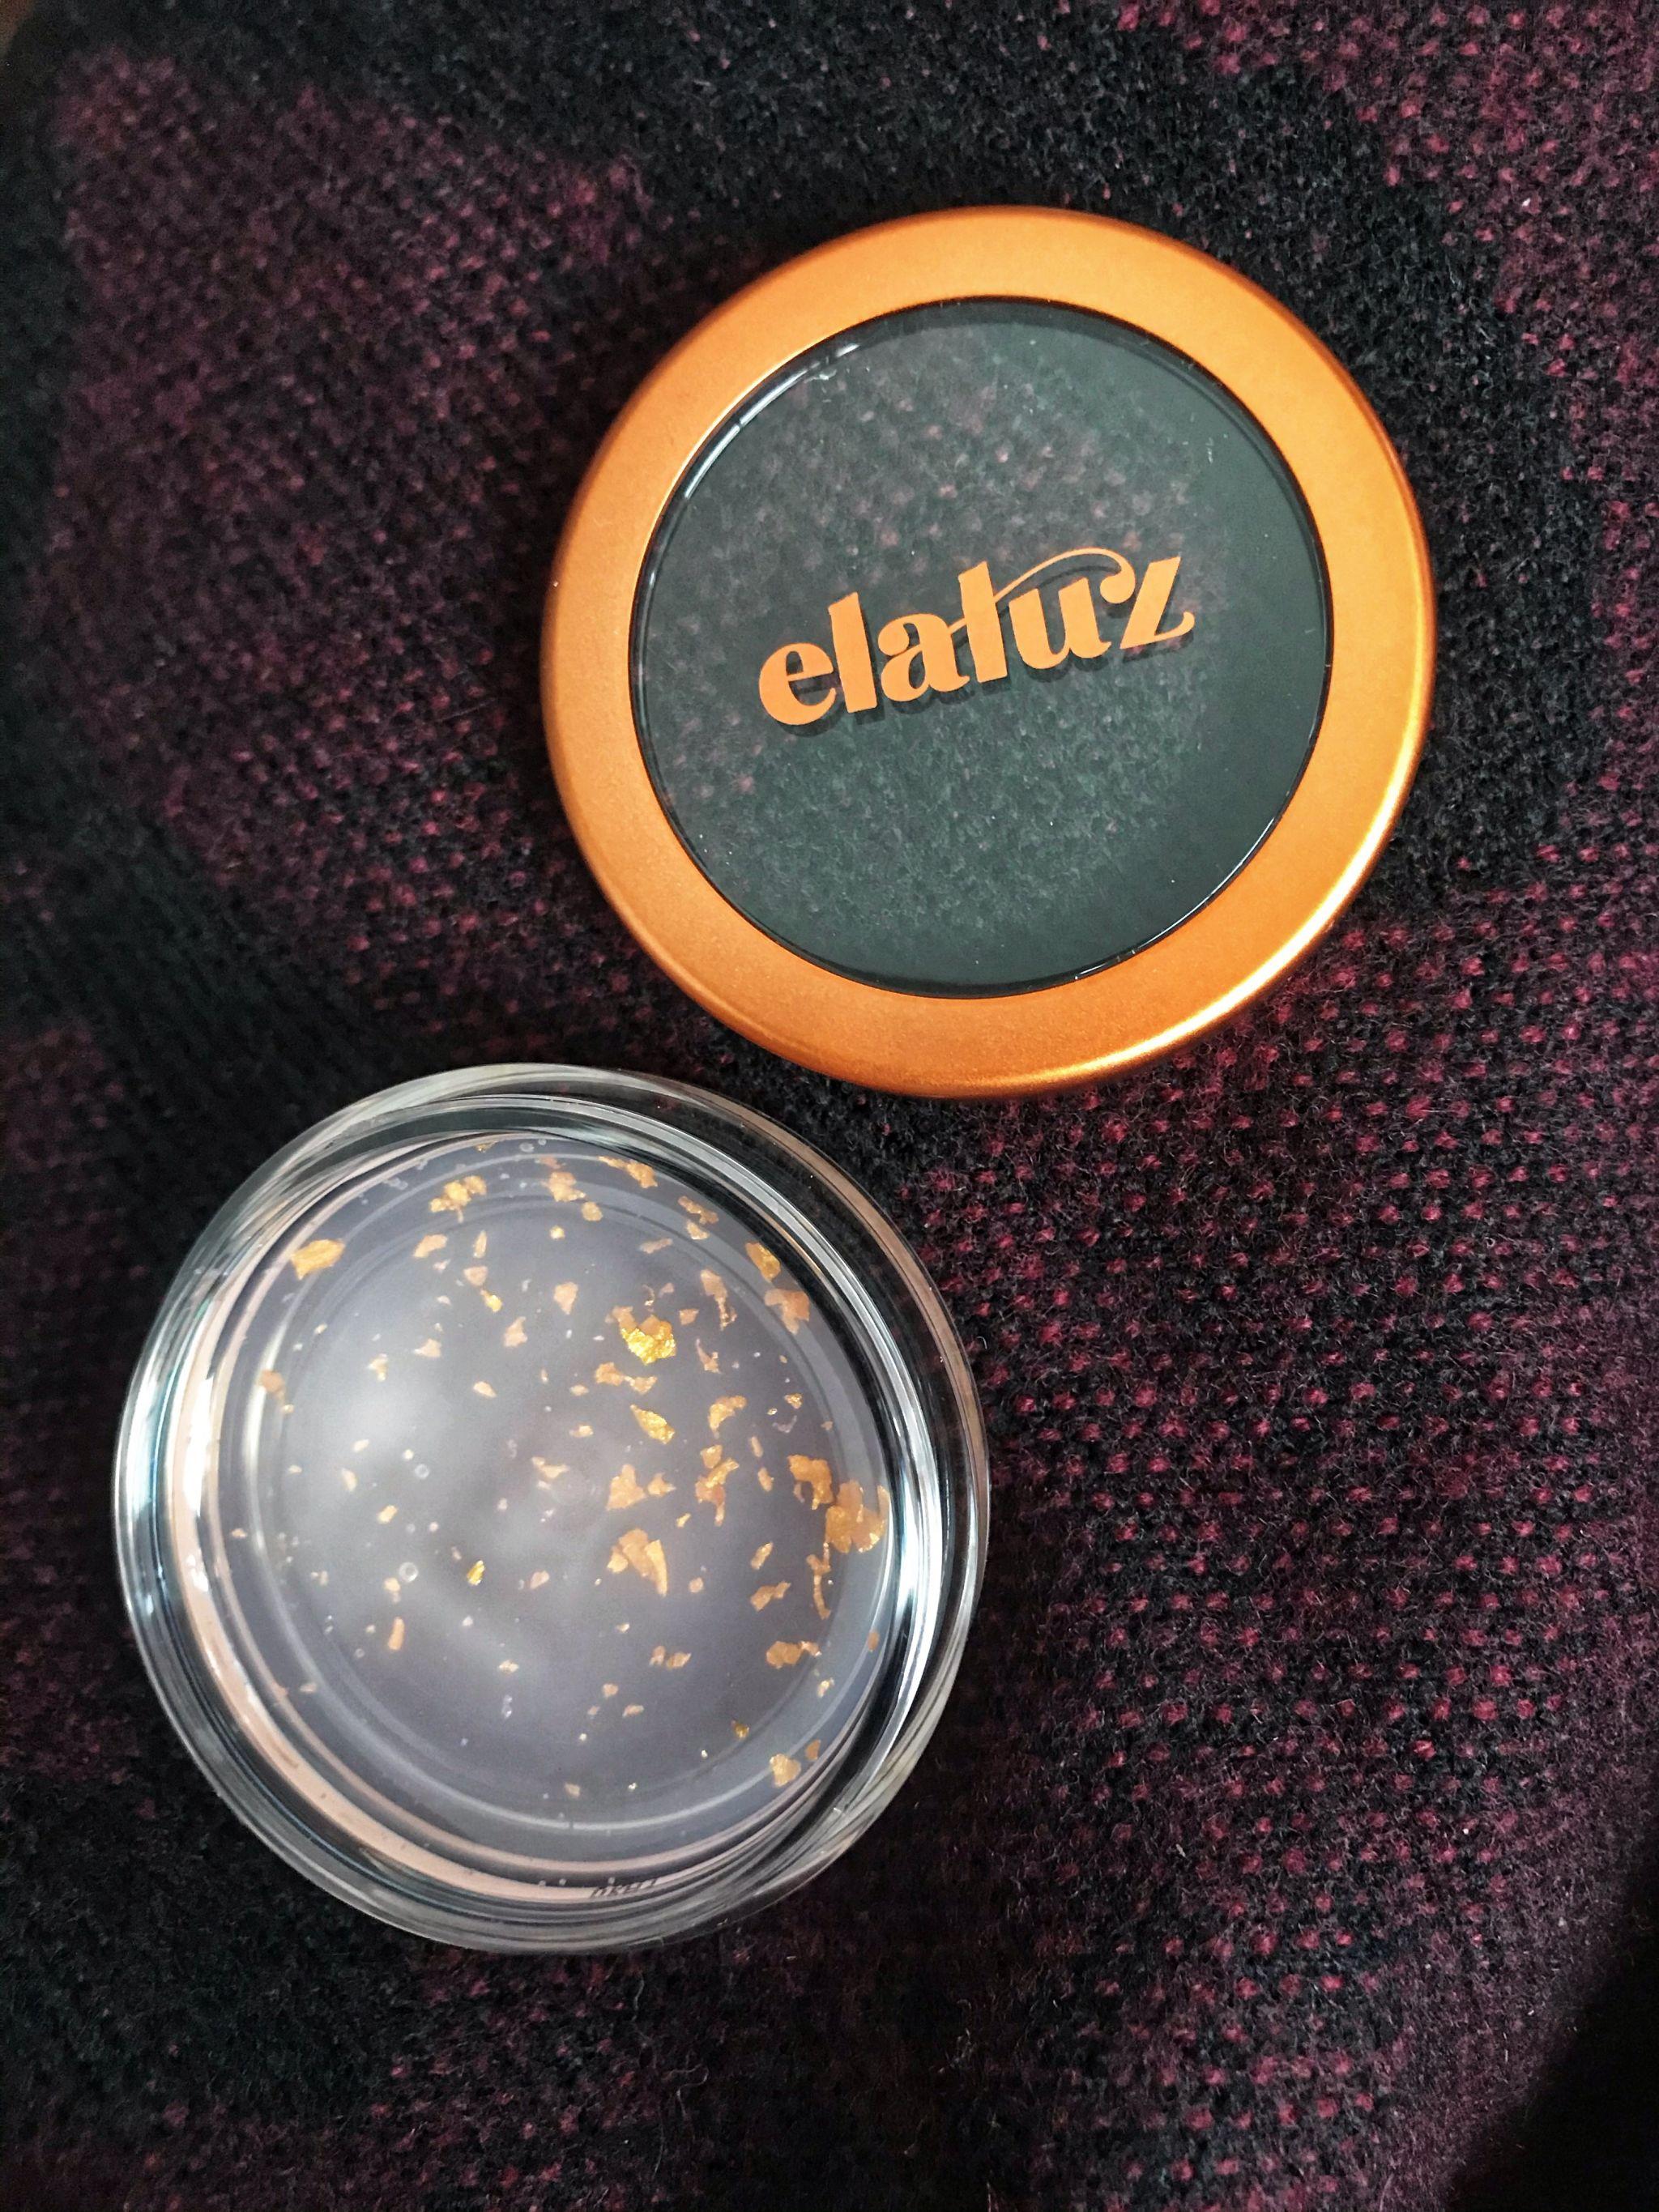 Elaluz 24K Lip Therapy - Winter Curateur Box